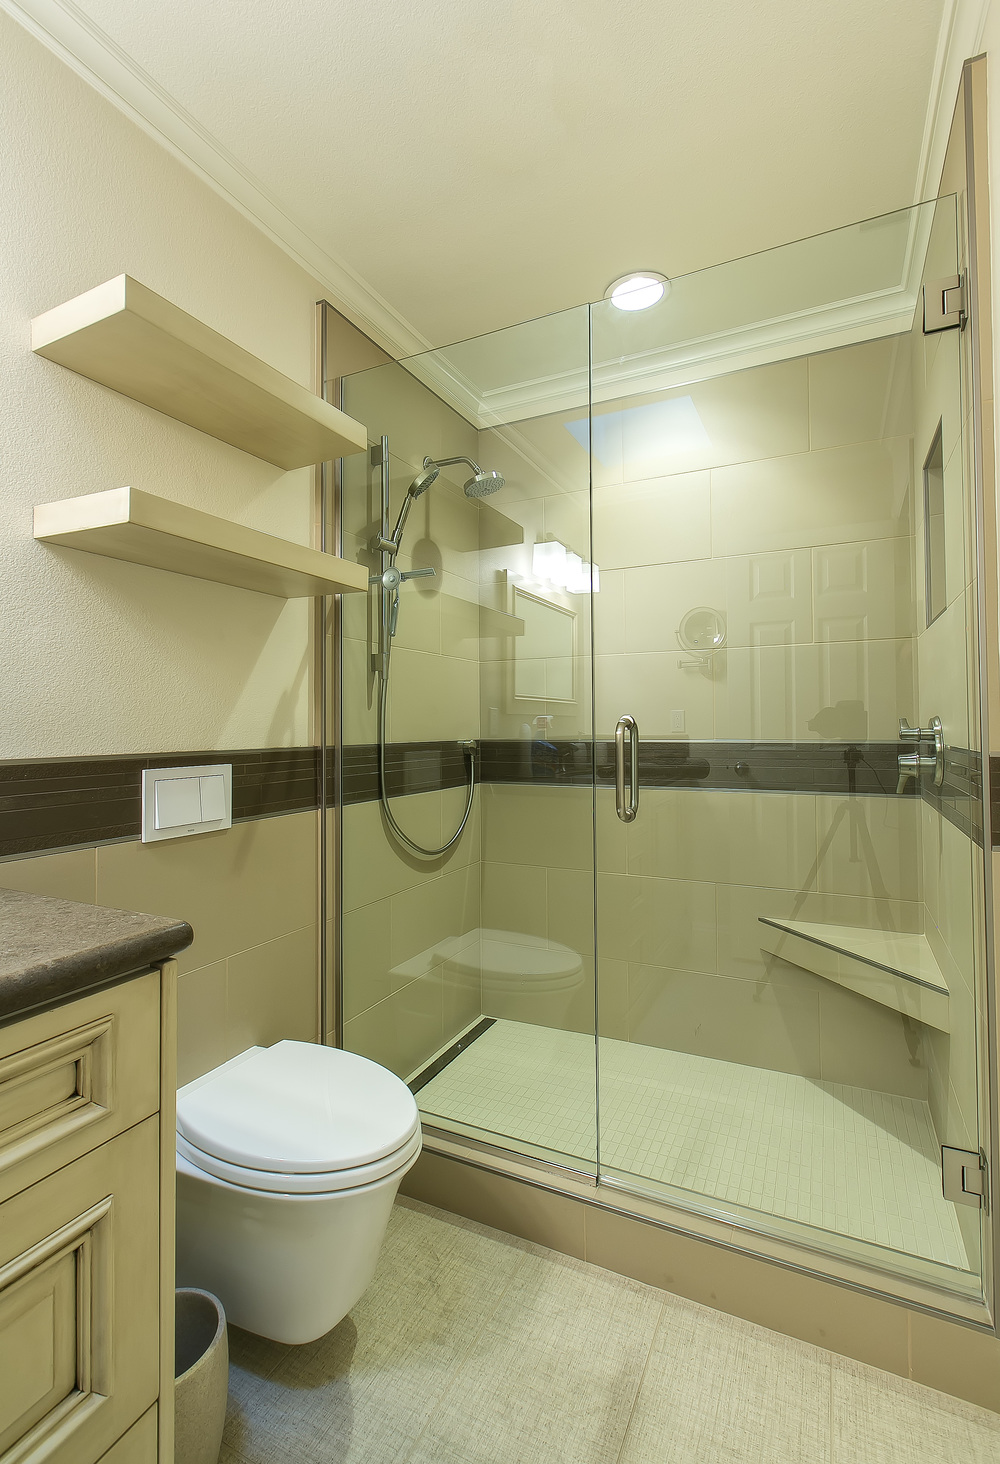 Bolinas bathroom 2.jpg